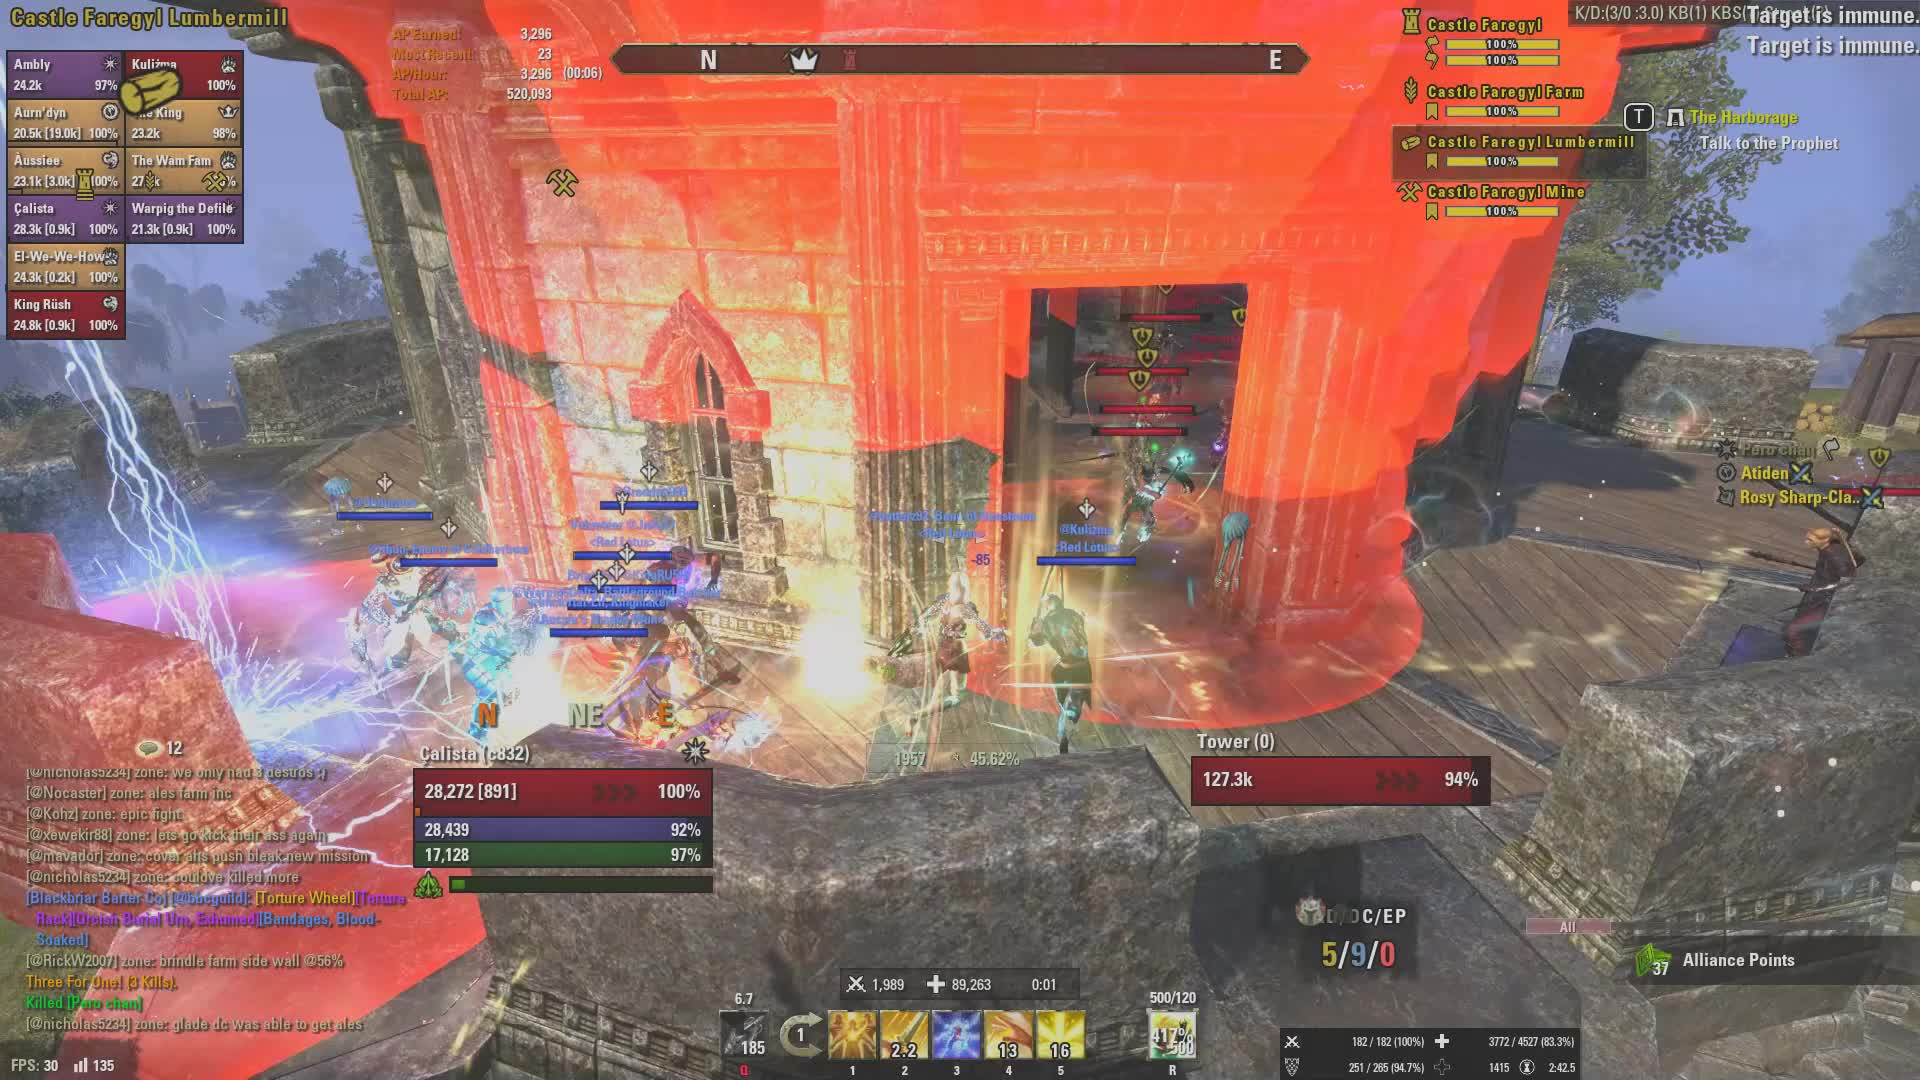 elderscrollsonline, Elder Scrolls Online 04.28.2018 - 00.06.01.02.DVRTrim GIFs